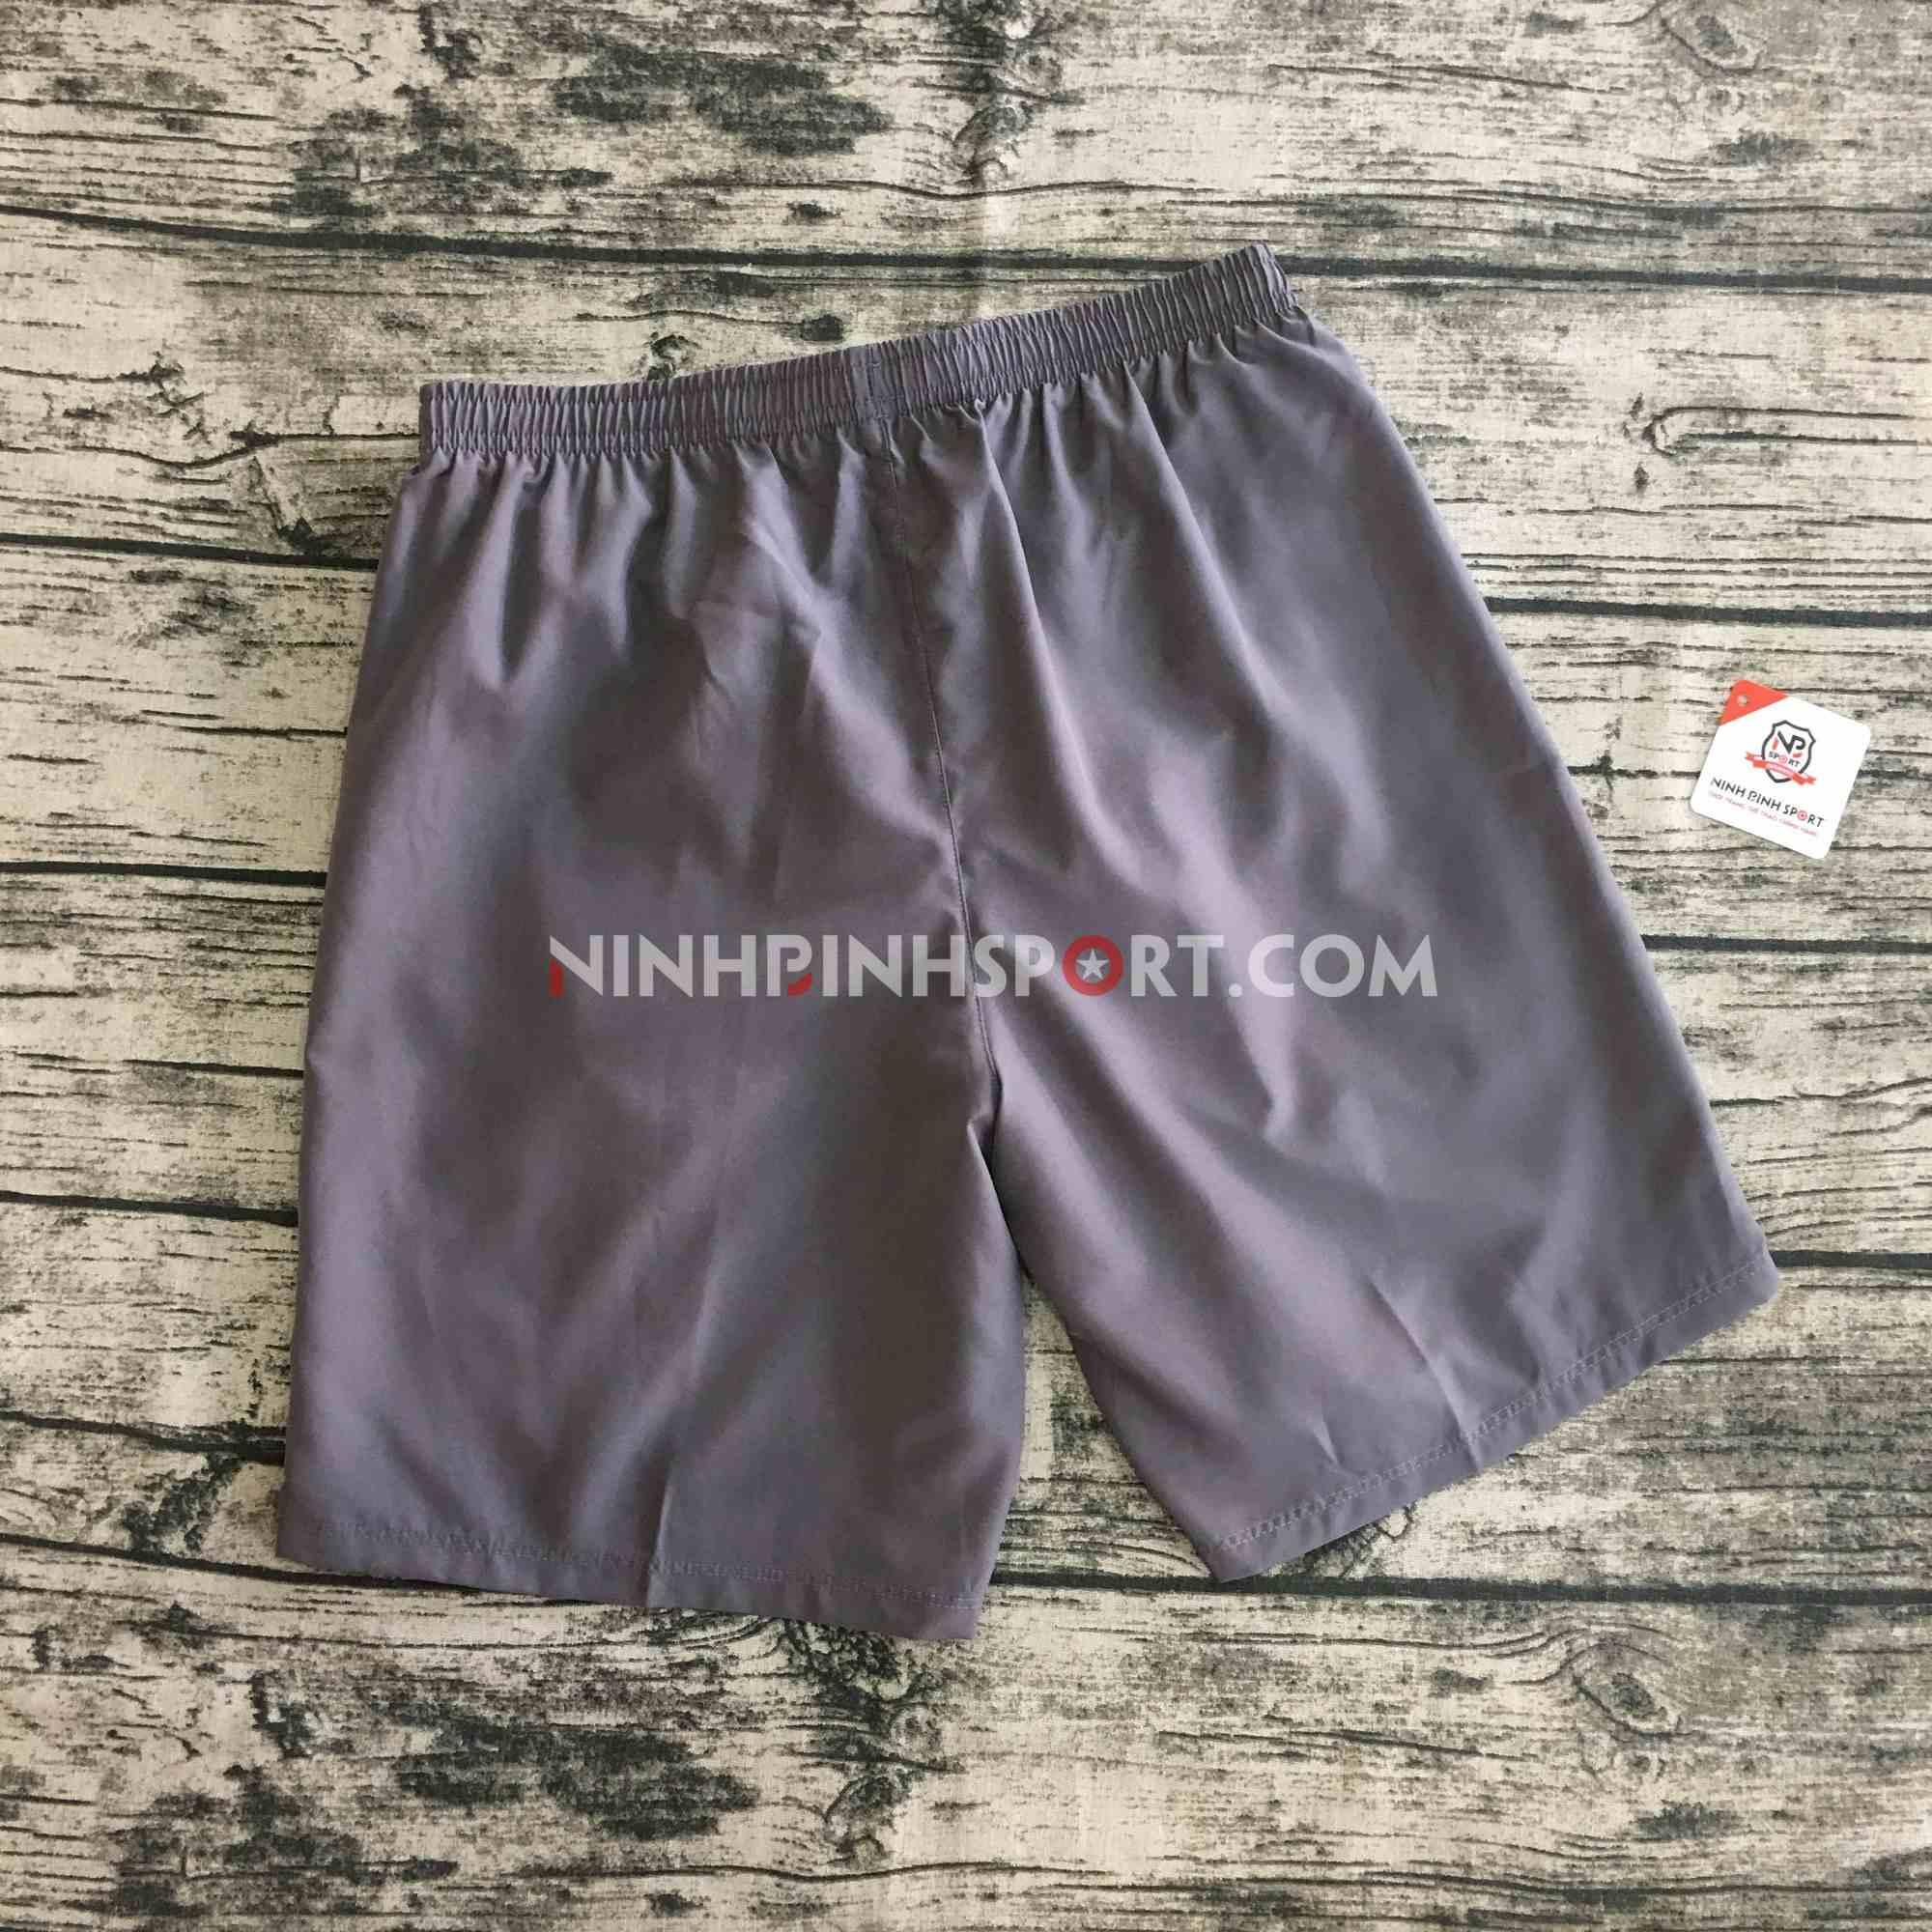 Quần thể thao nam Nike Orchid GX 7in AJ7756-056